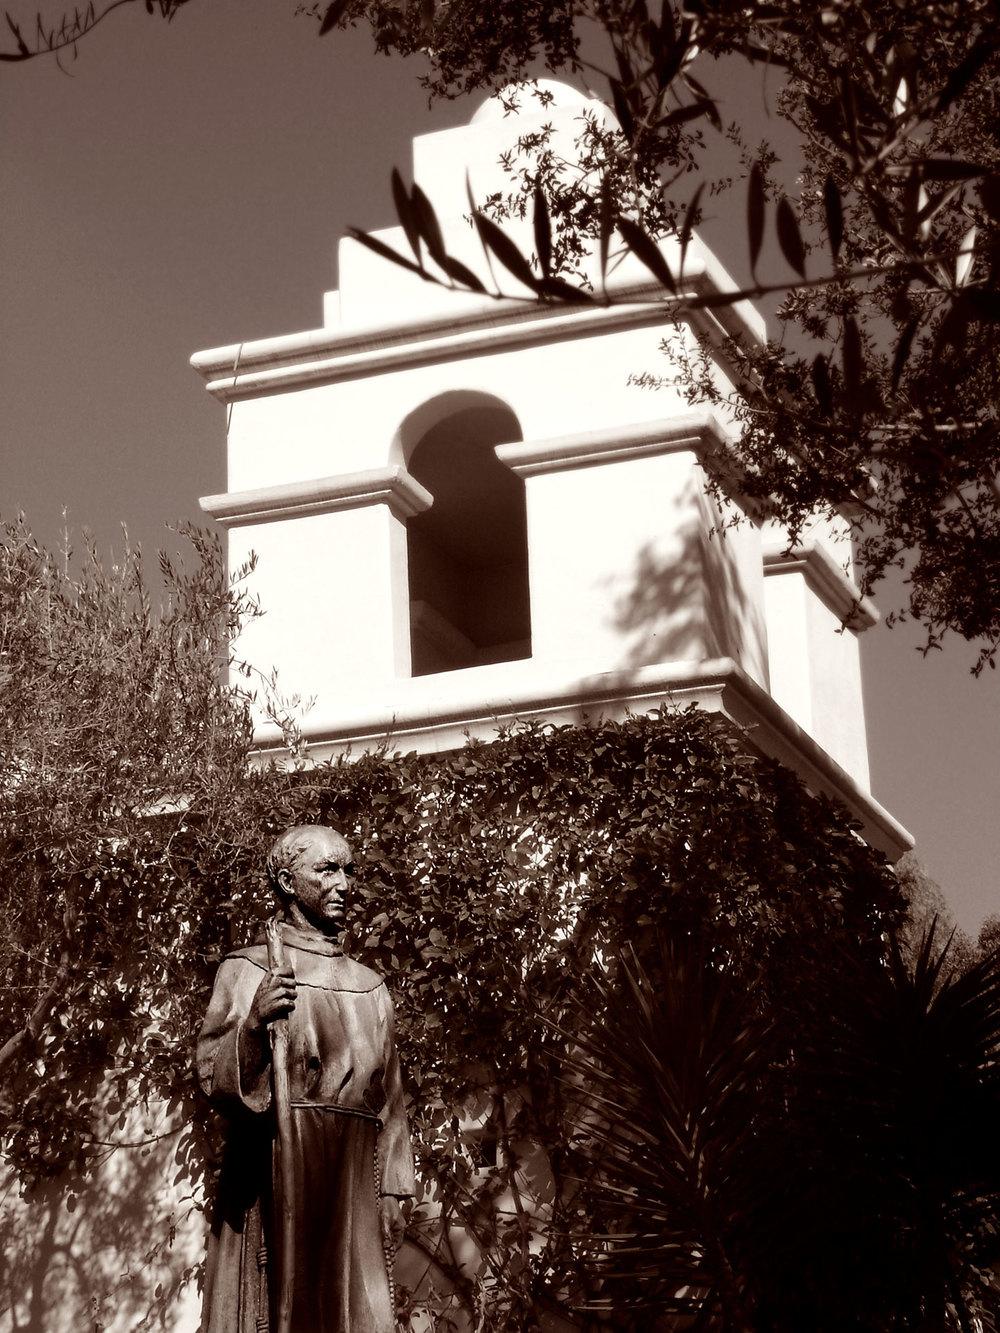 Rudy-Poe-FatherSerra_seiaish-1920-web.jpg